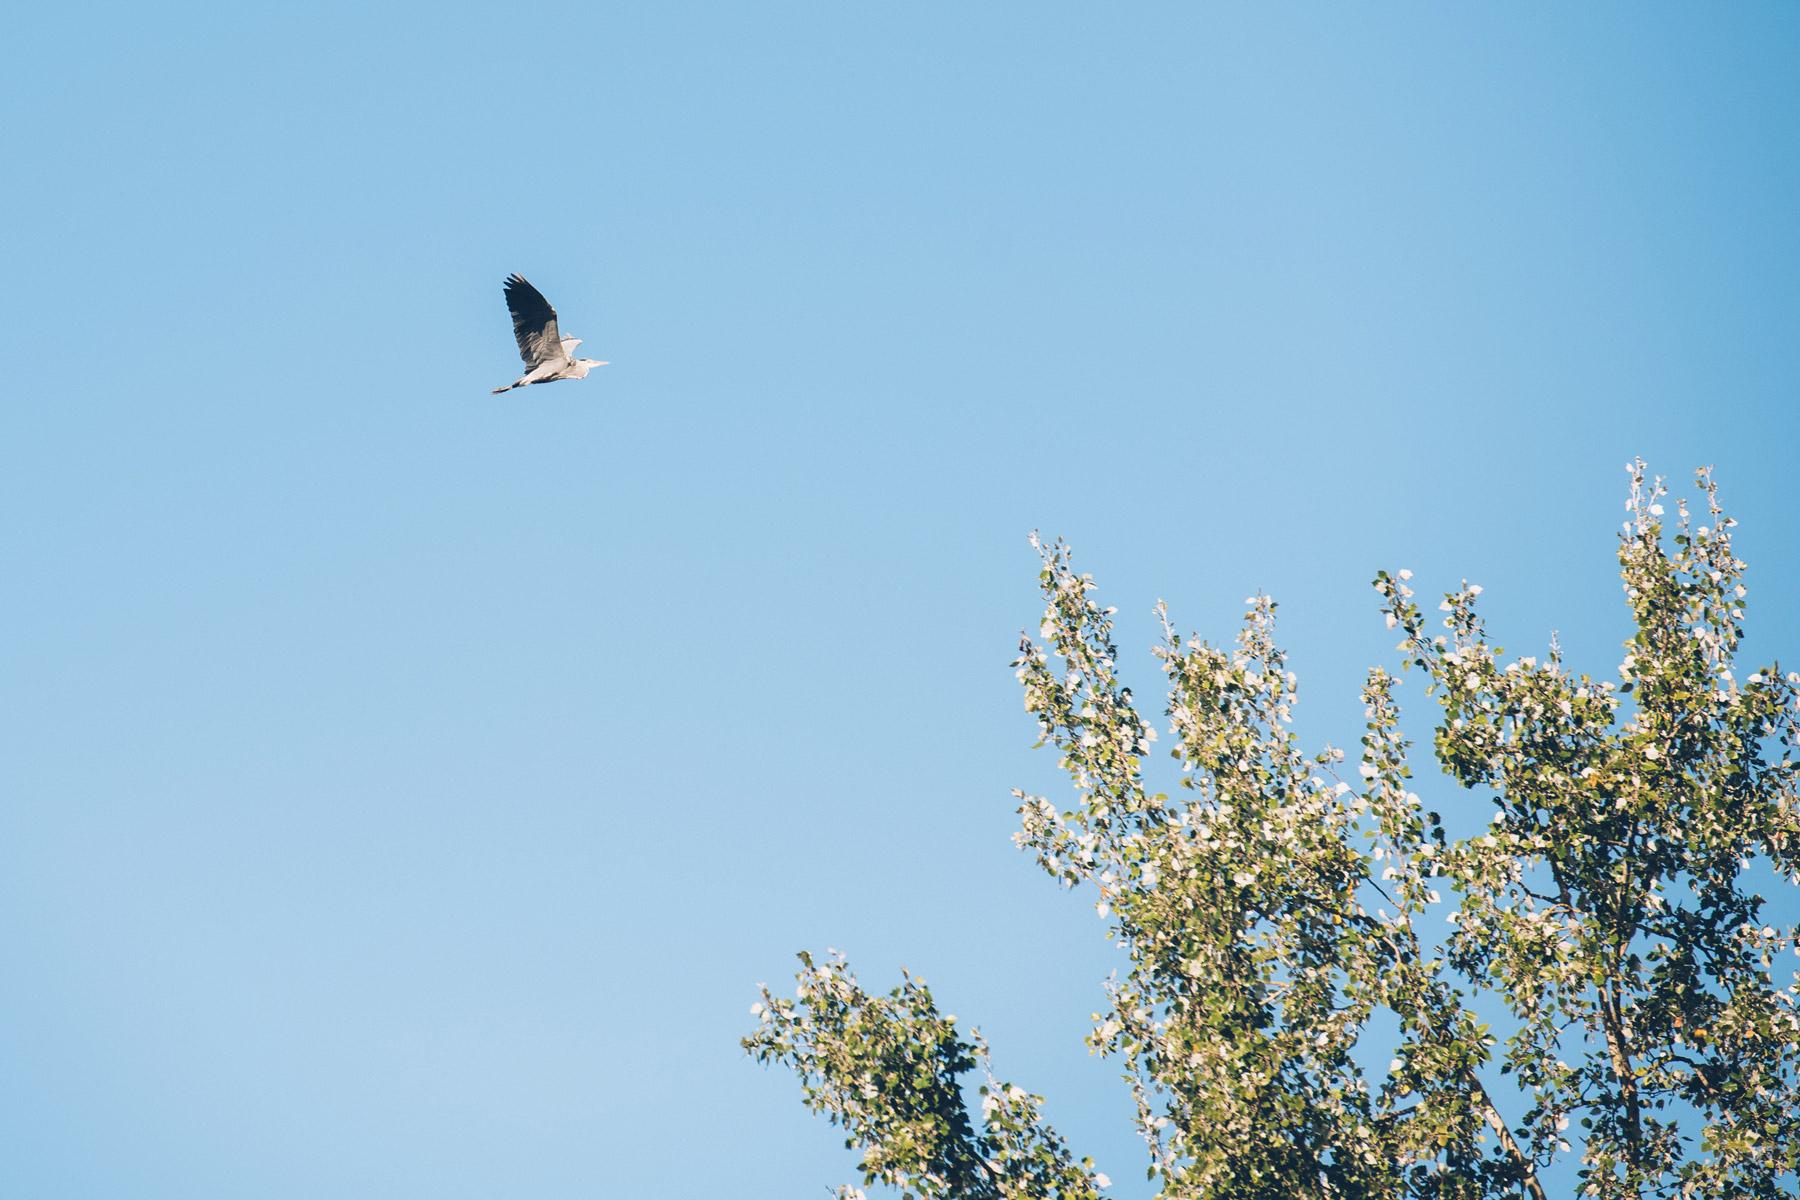 Heron, Ile de Rhinau